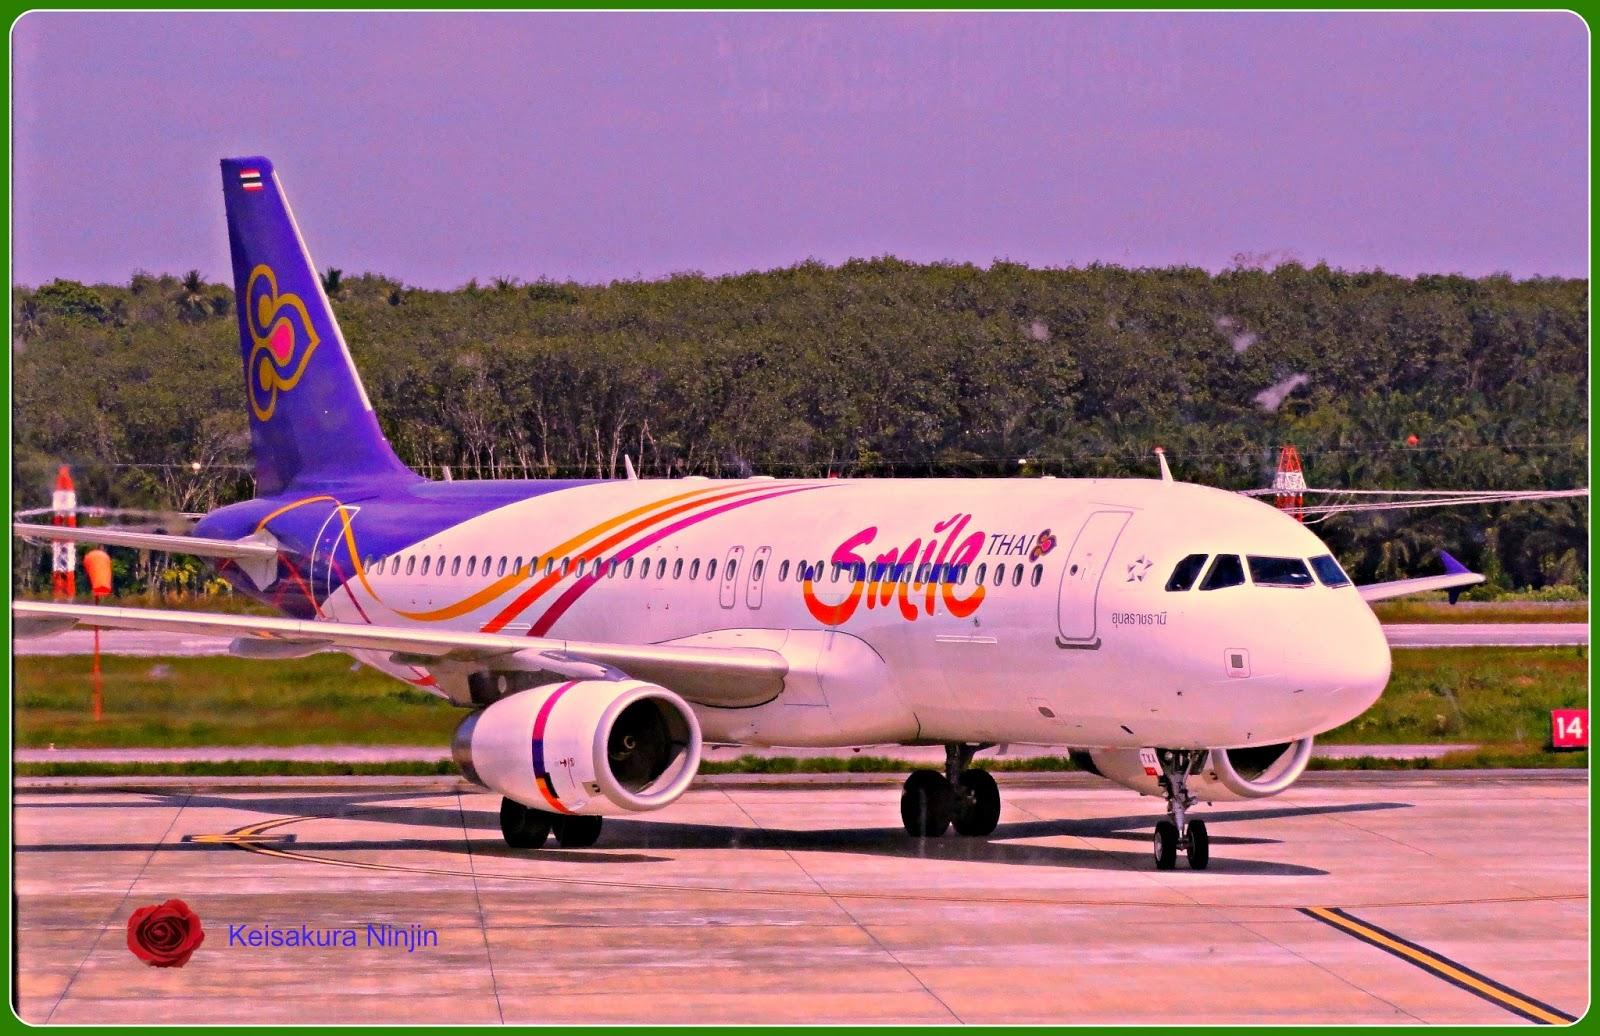 TG ao nang to Bangkok